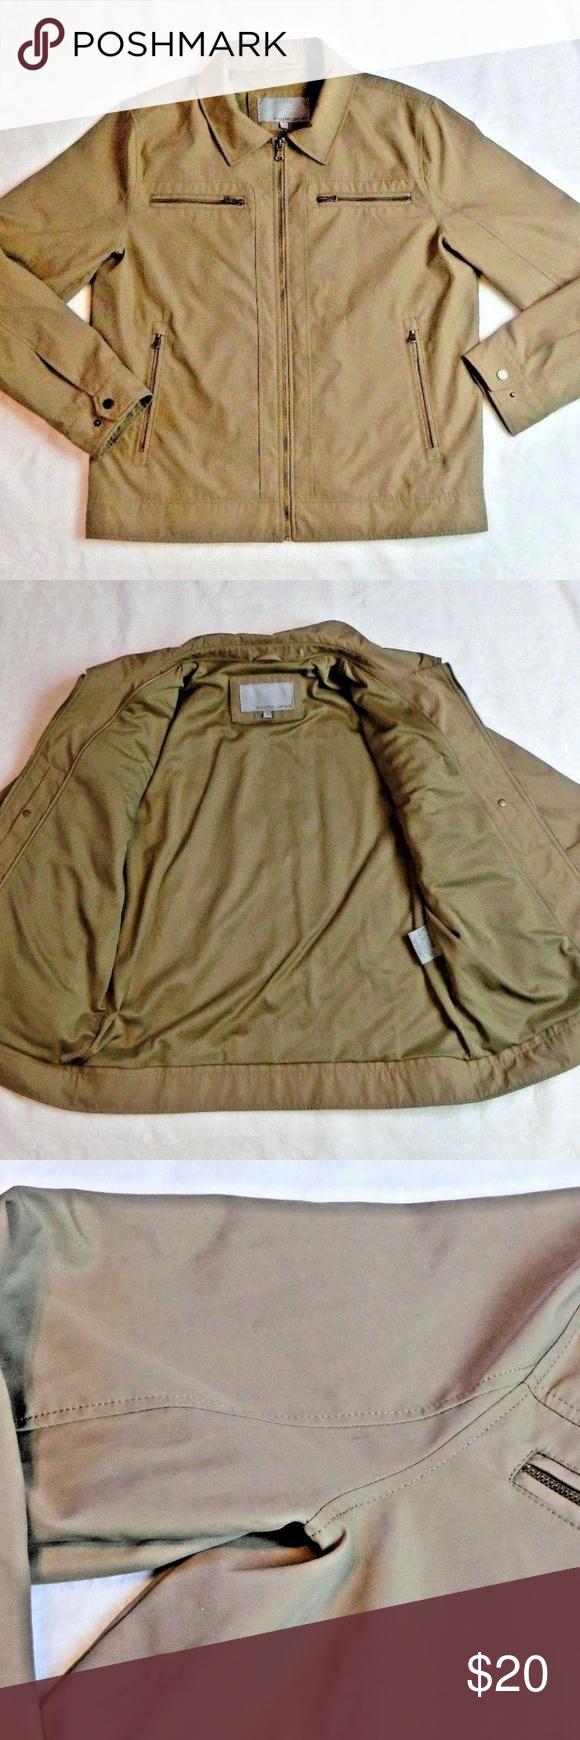 Wilsons Leather brown jacket w/ rabbit fur lining